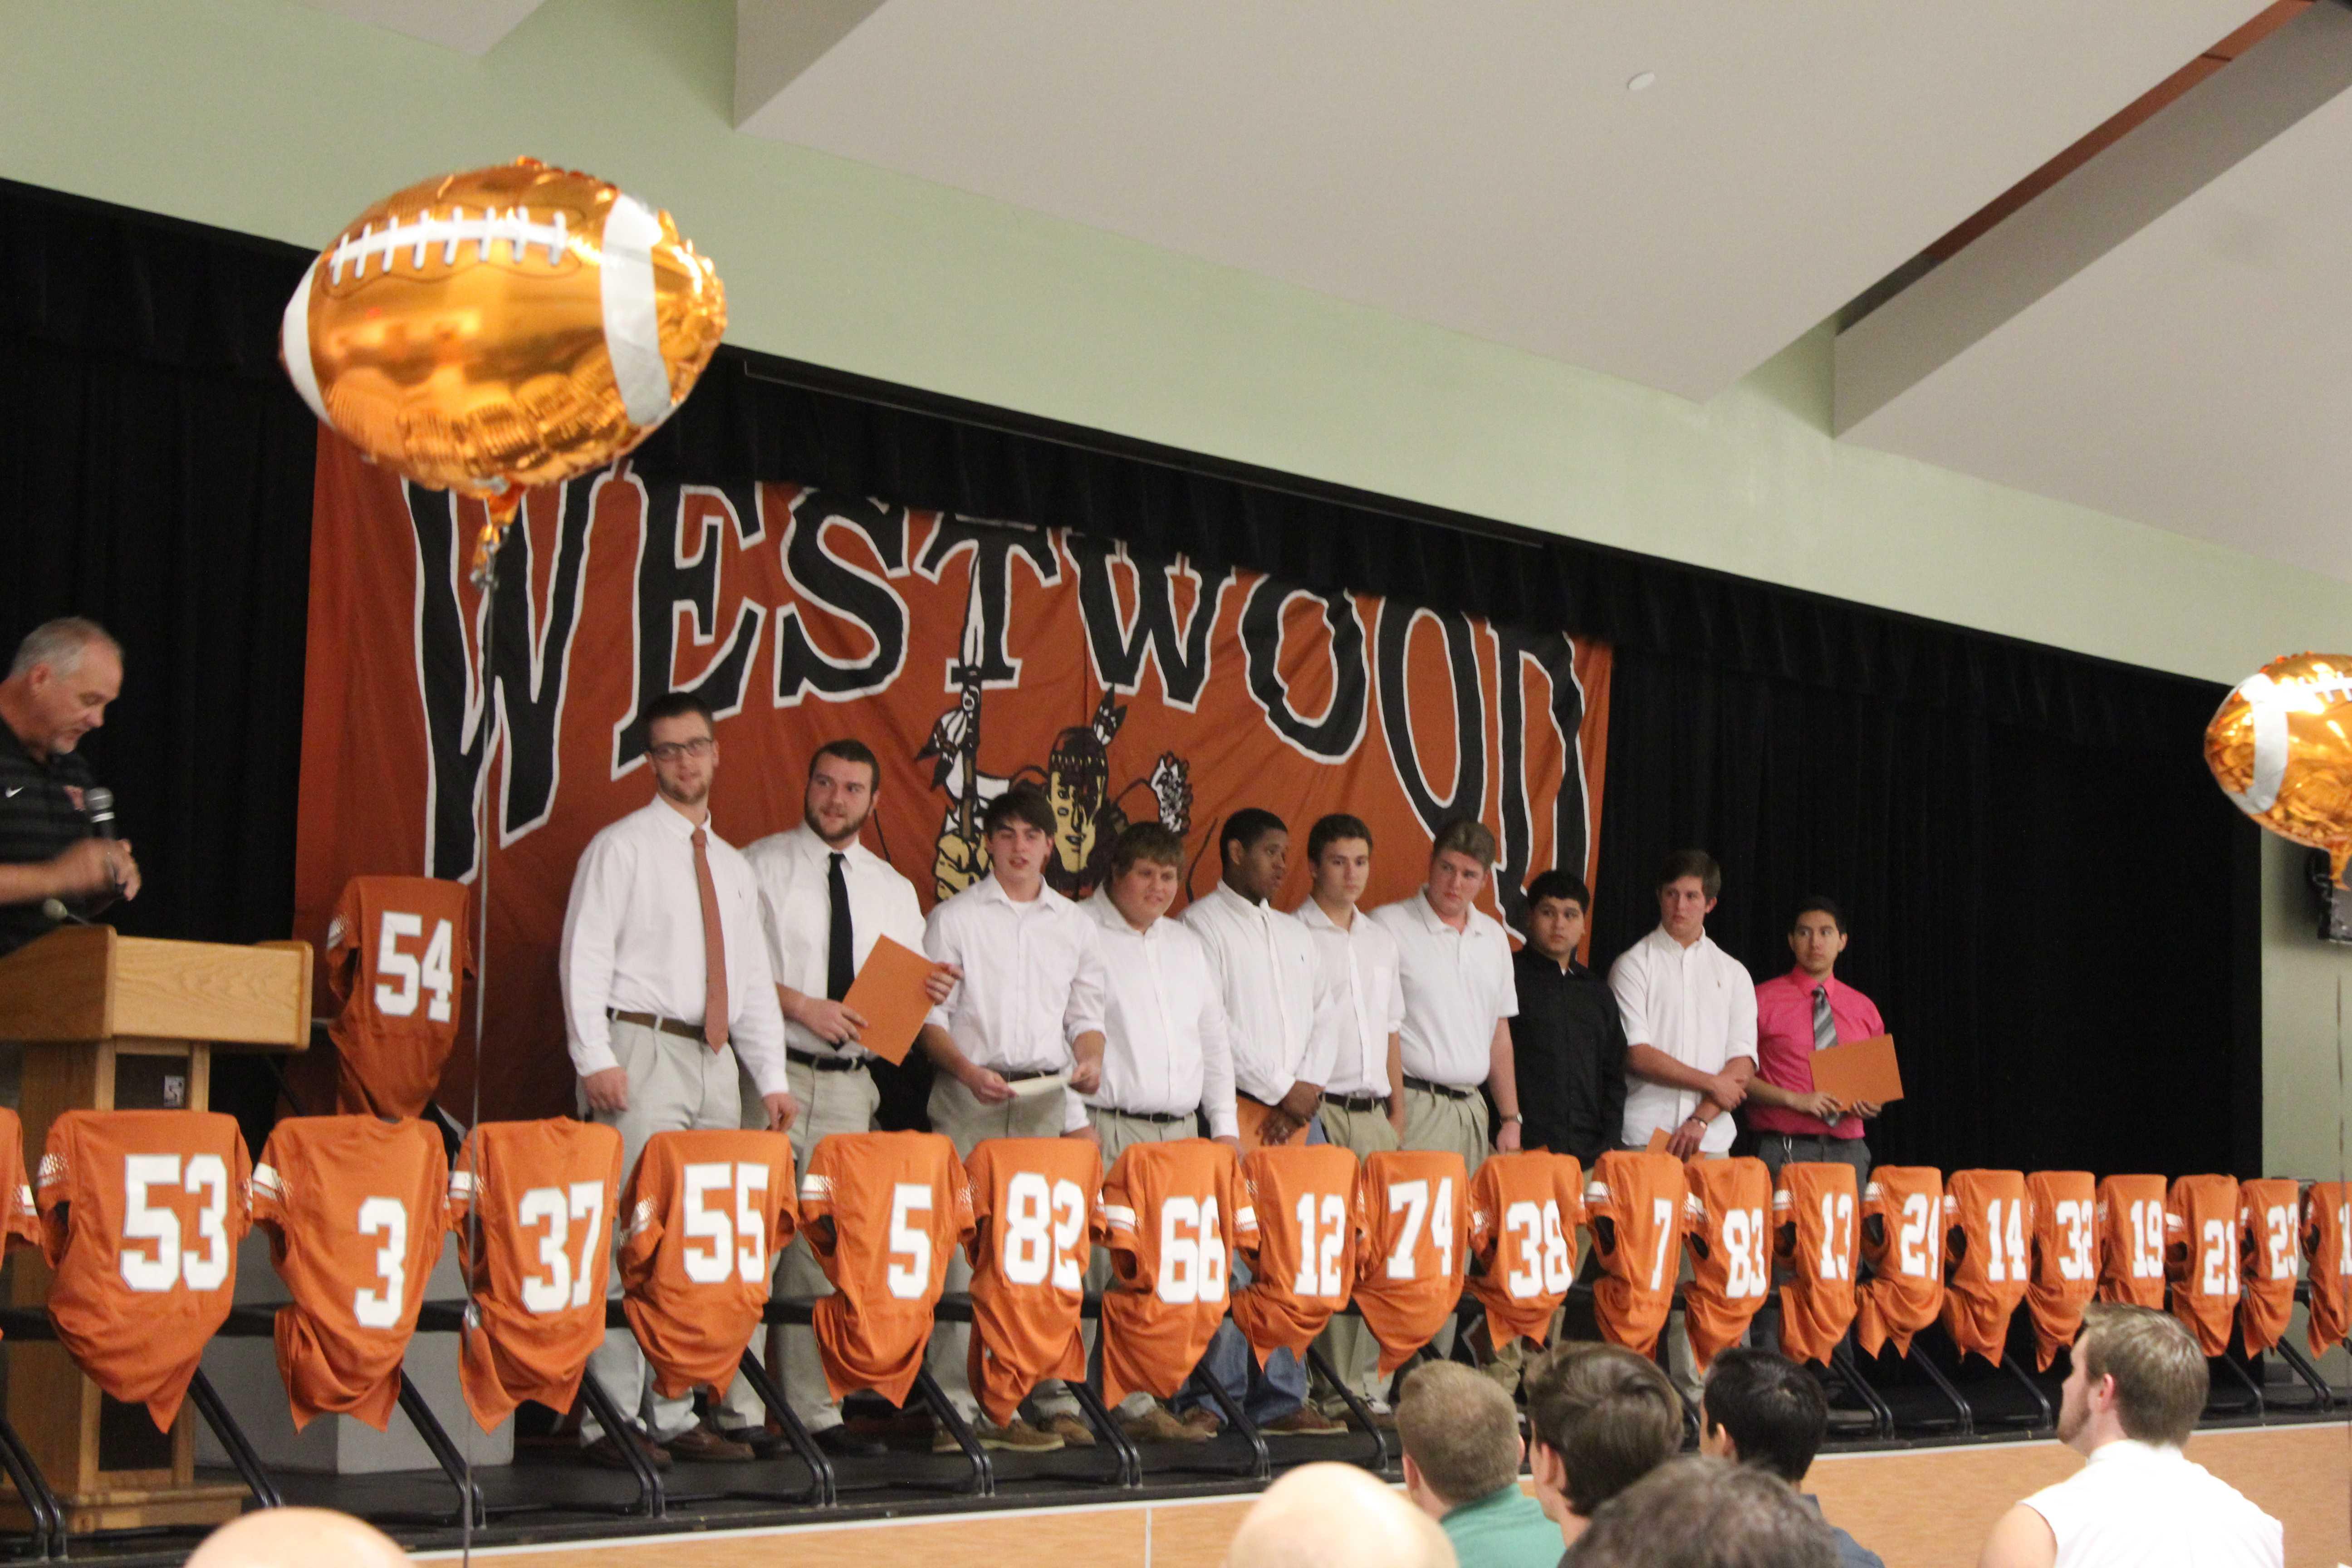 Westwood horizon football team celebrates season with for Athletic banquet decoration ideas